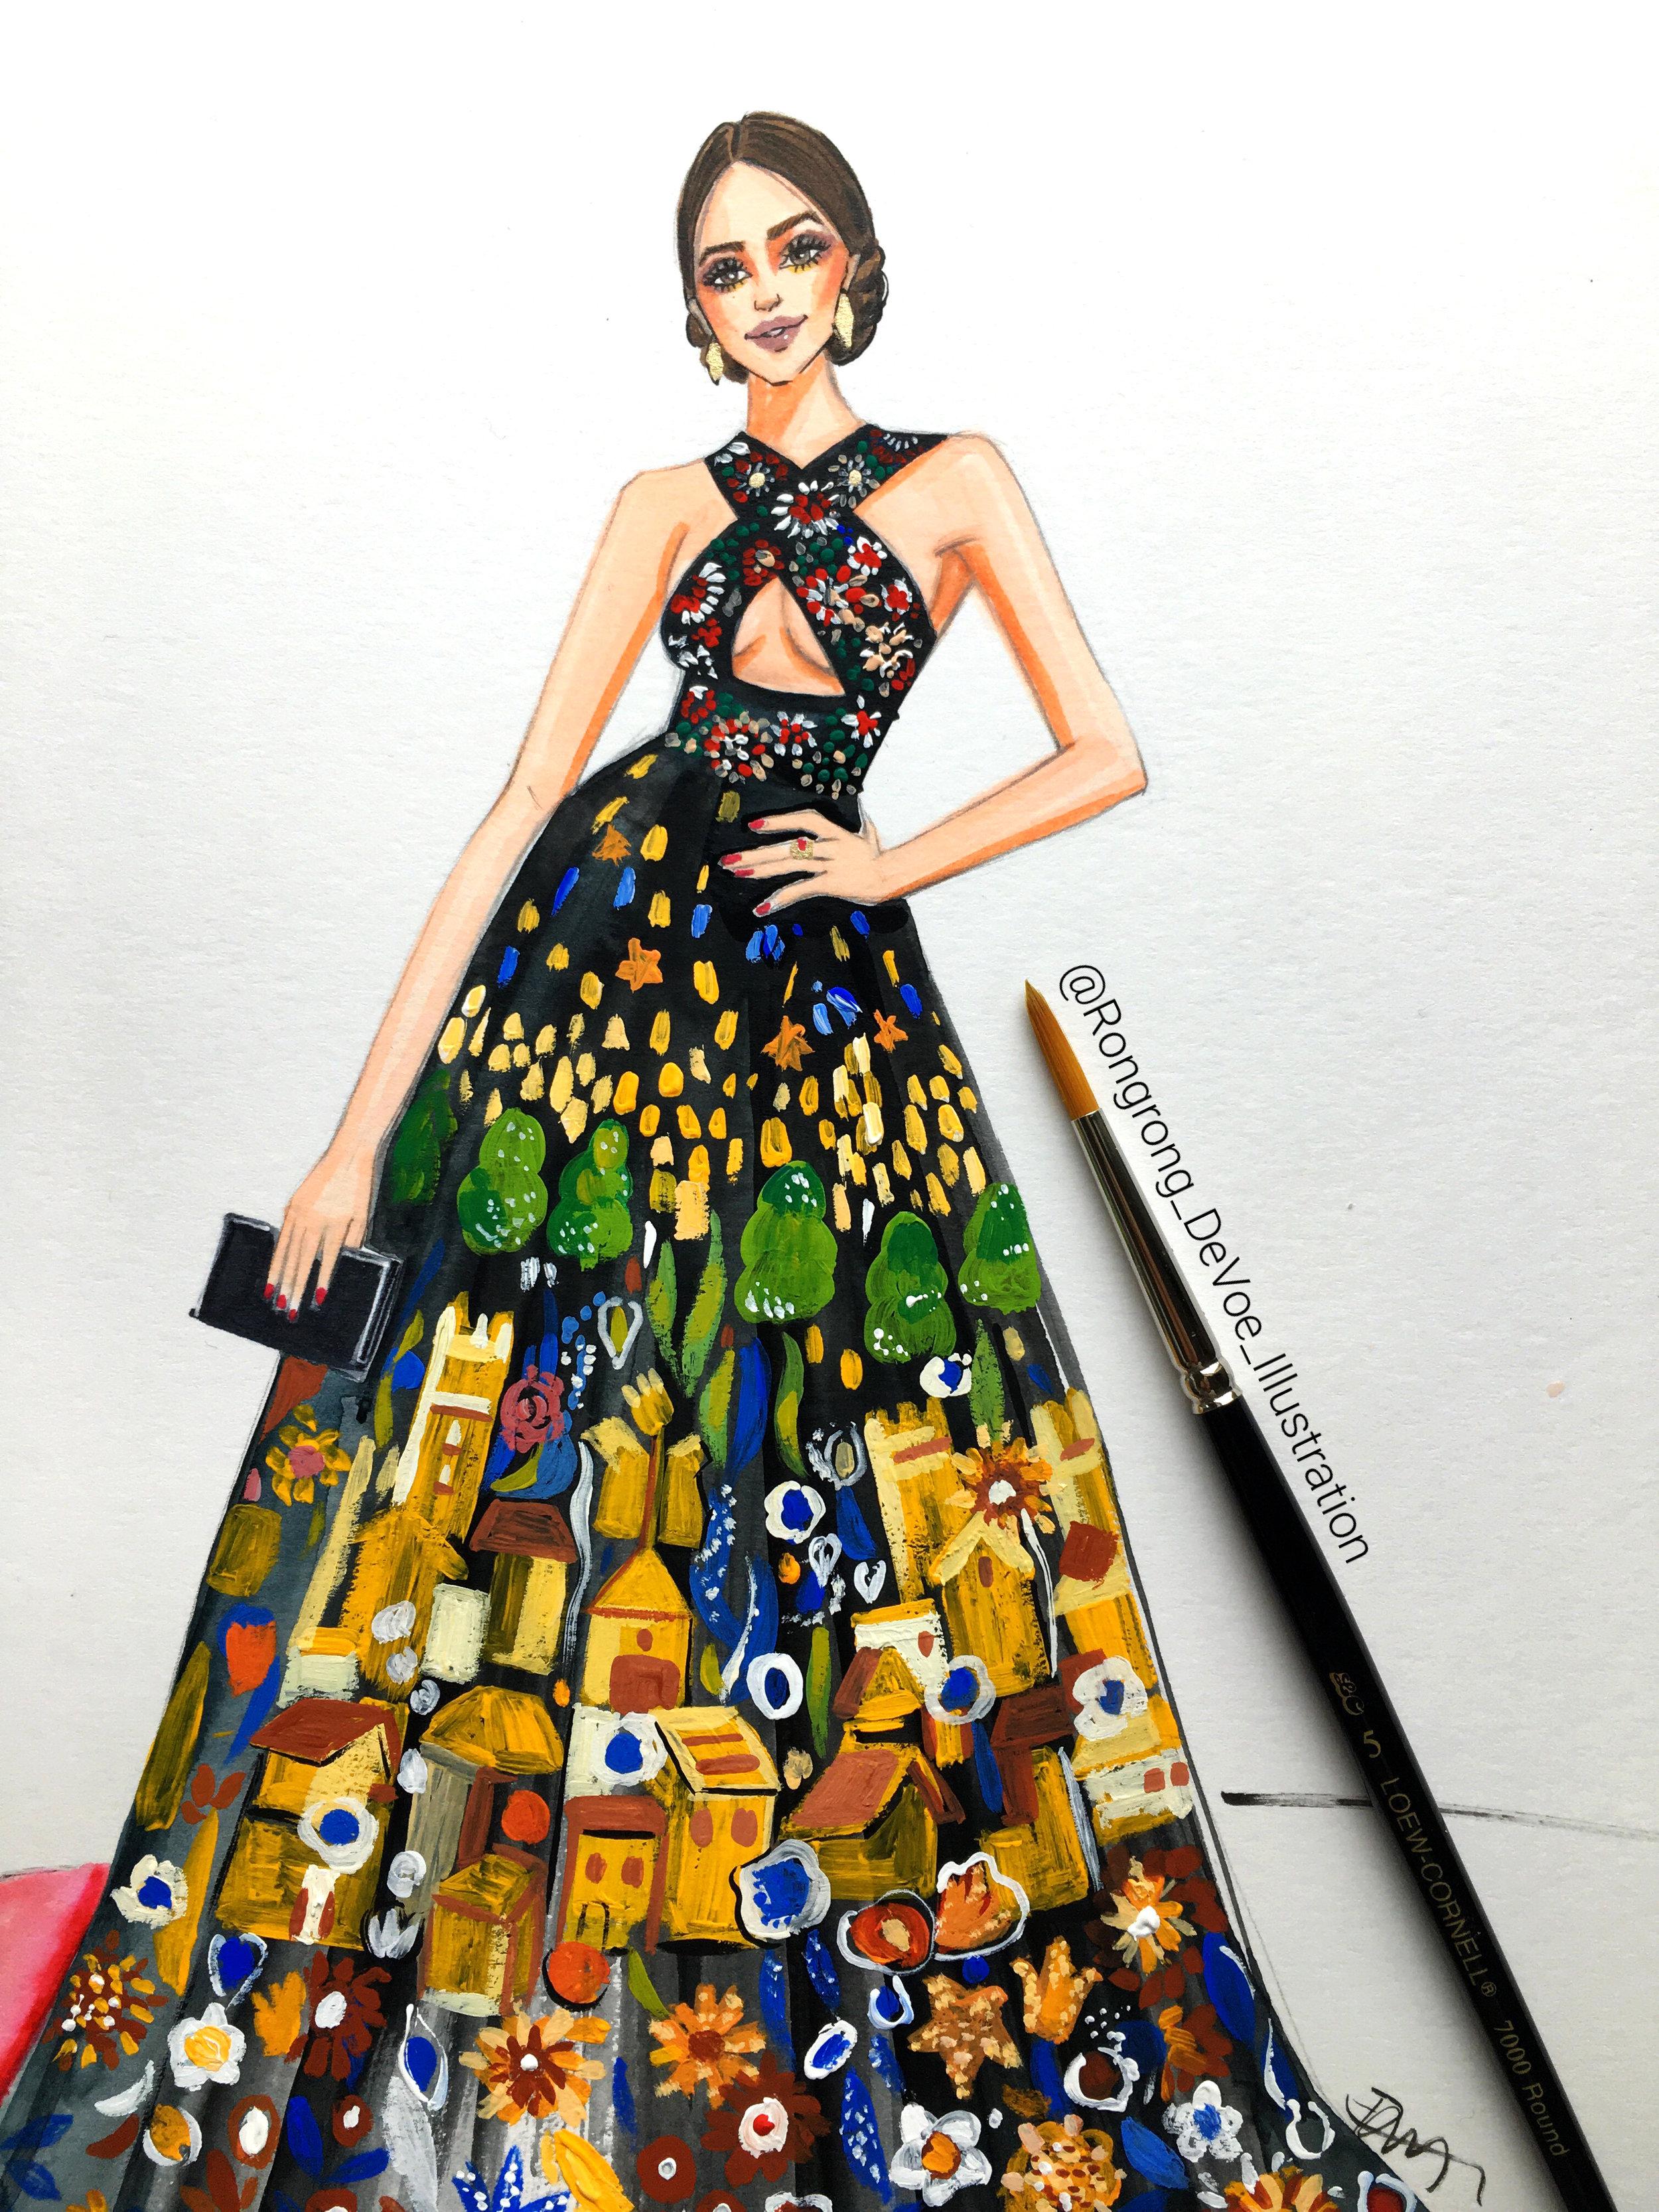 Blog Fashion And Beauty Illustrator Rongrong Devoe